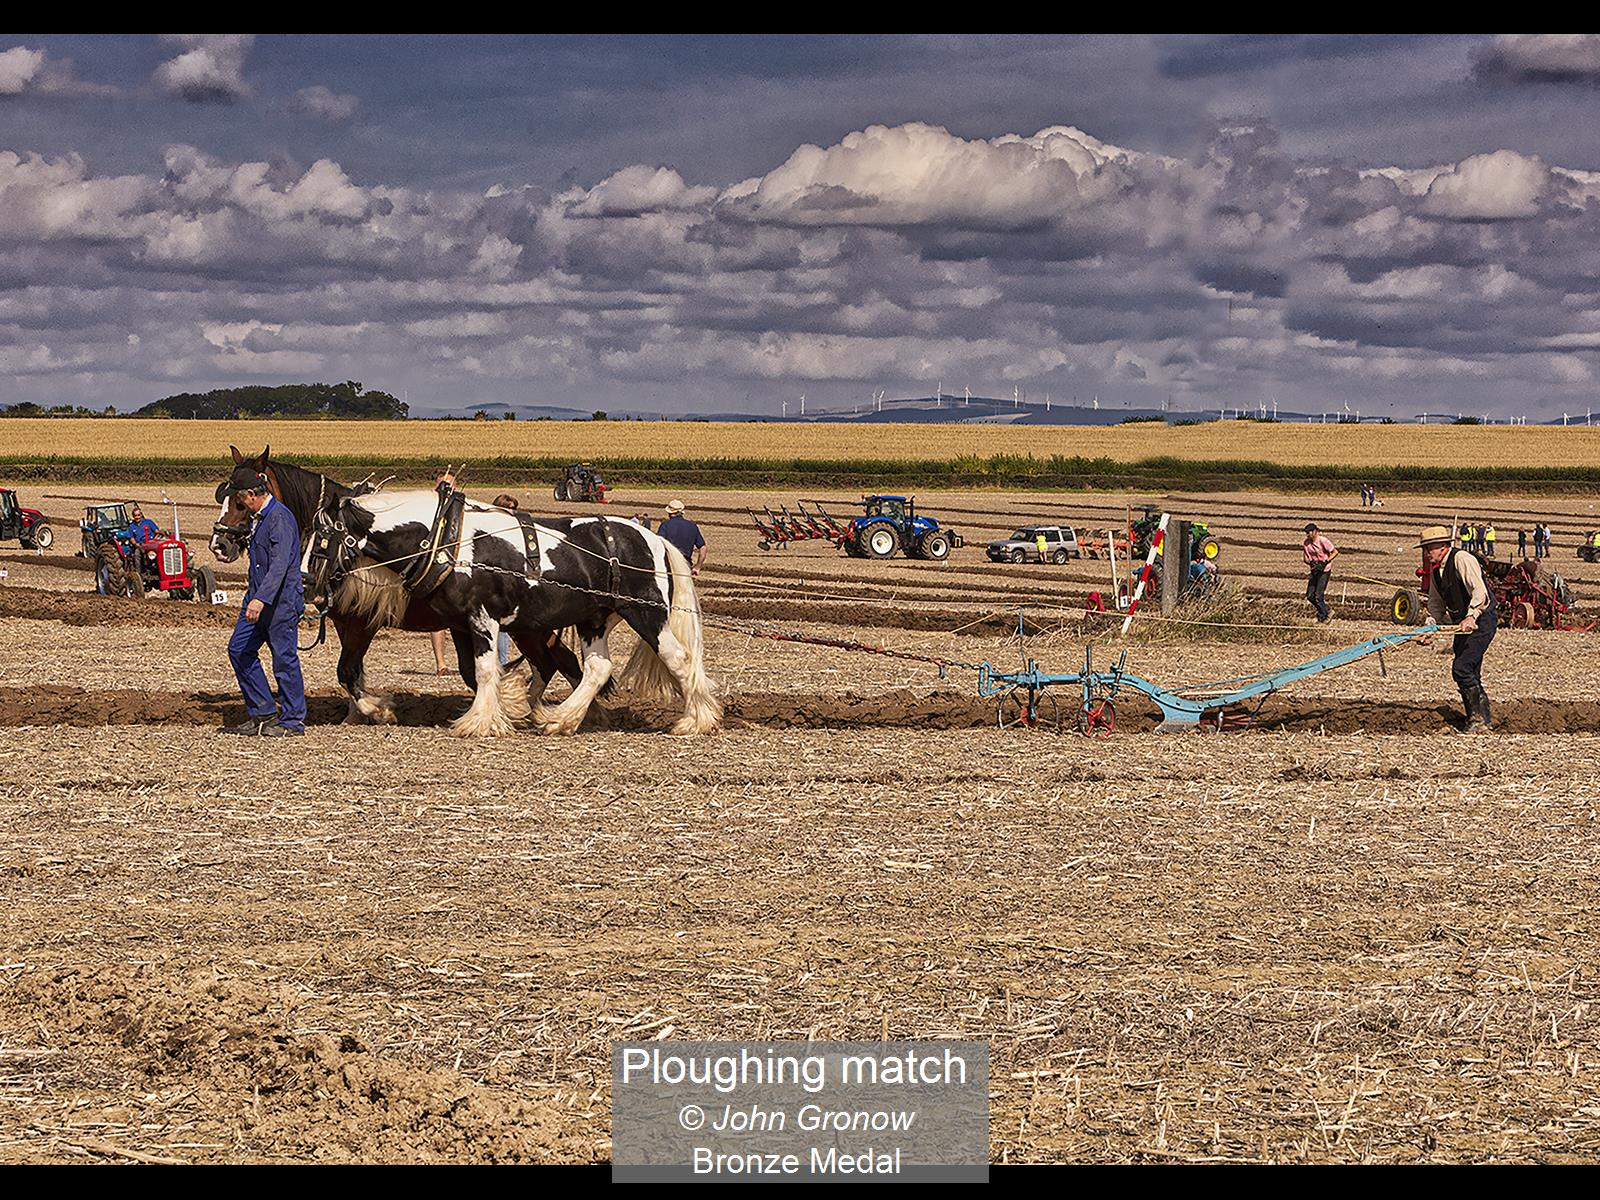 Ploughing match_John Gronow_Bronze